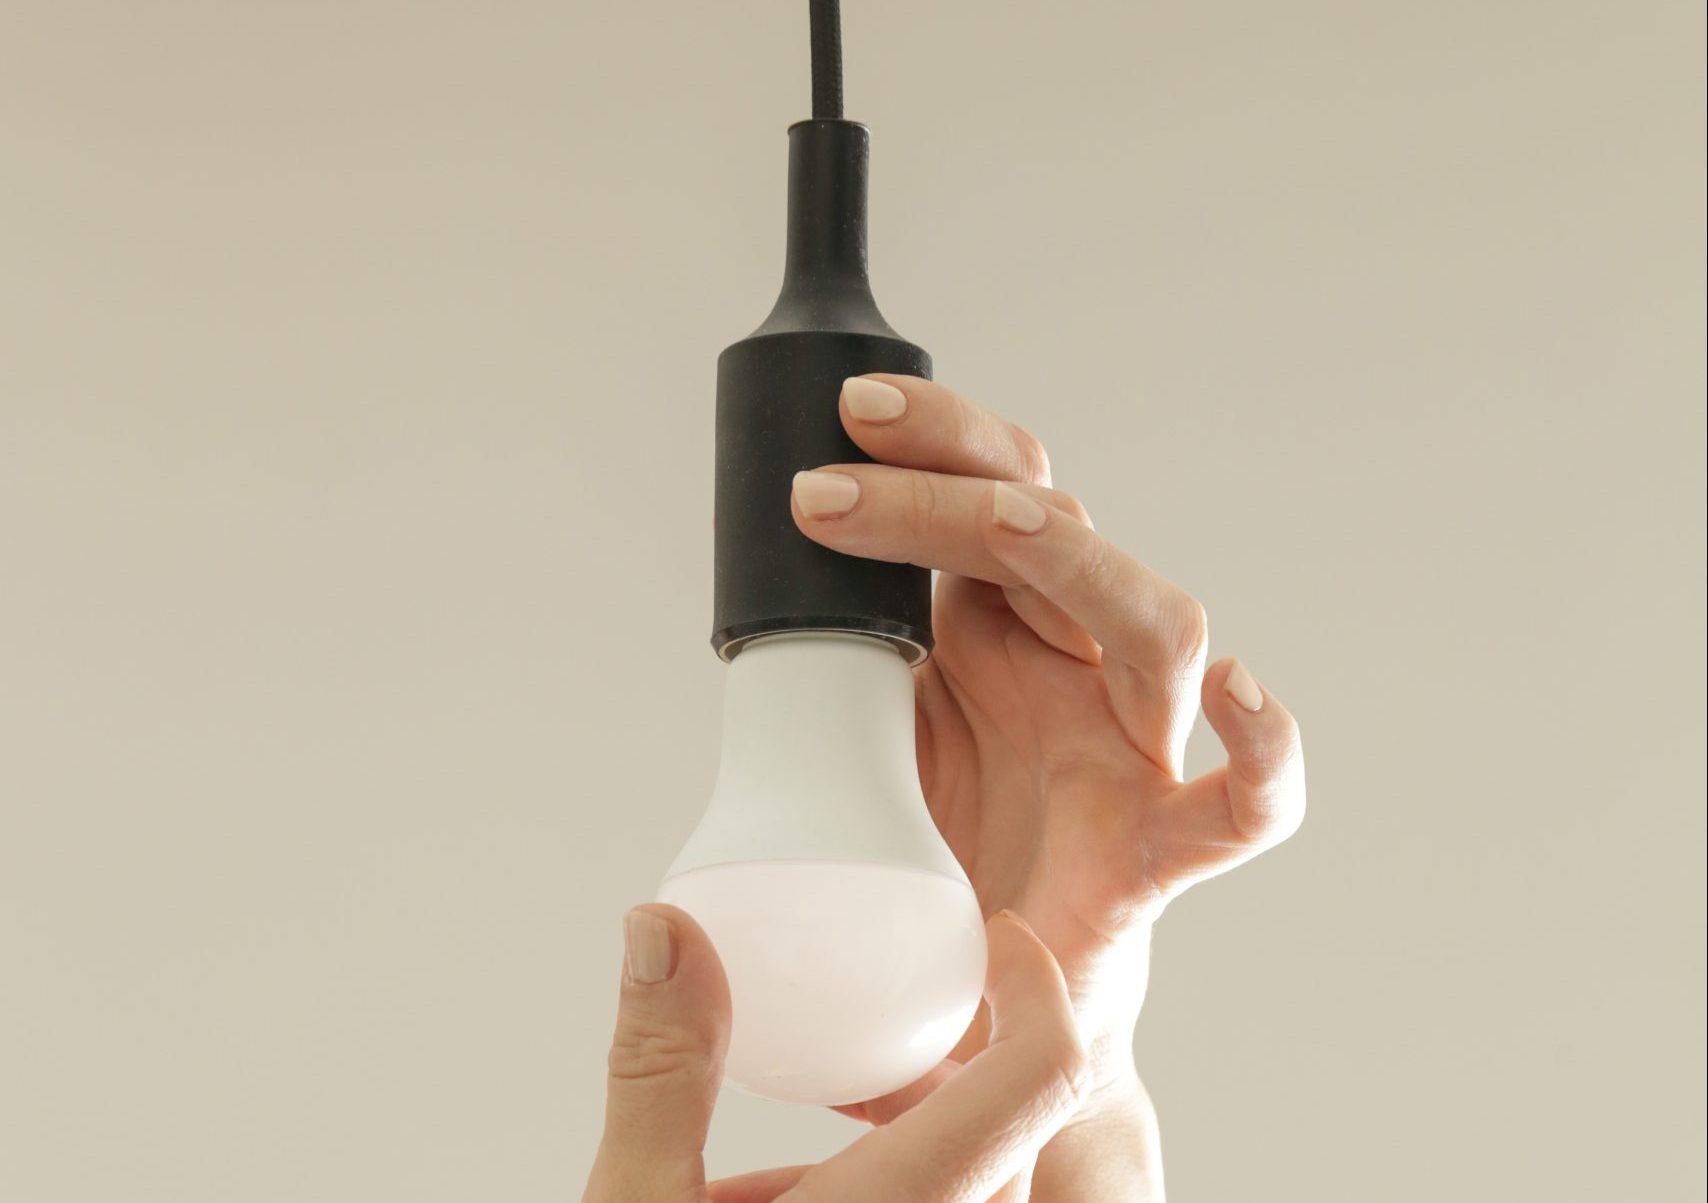 Efficient Light Bulbs Make Your RV Green